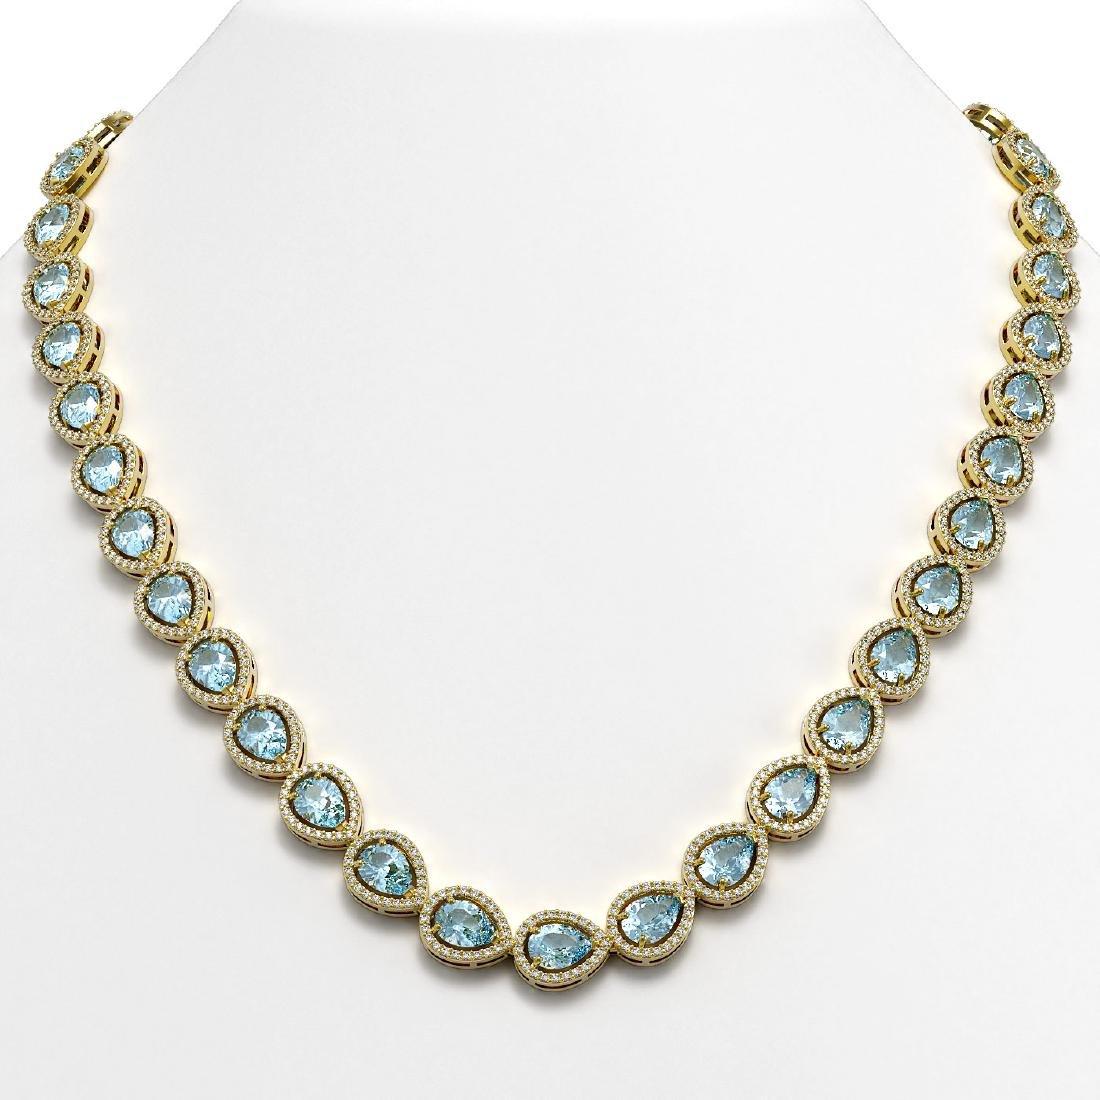 33.35 CTW Aquamarine & Diamond Halo Necklace 10K Yellow